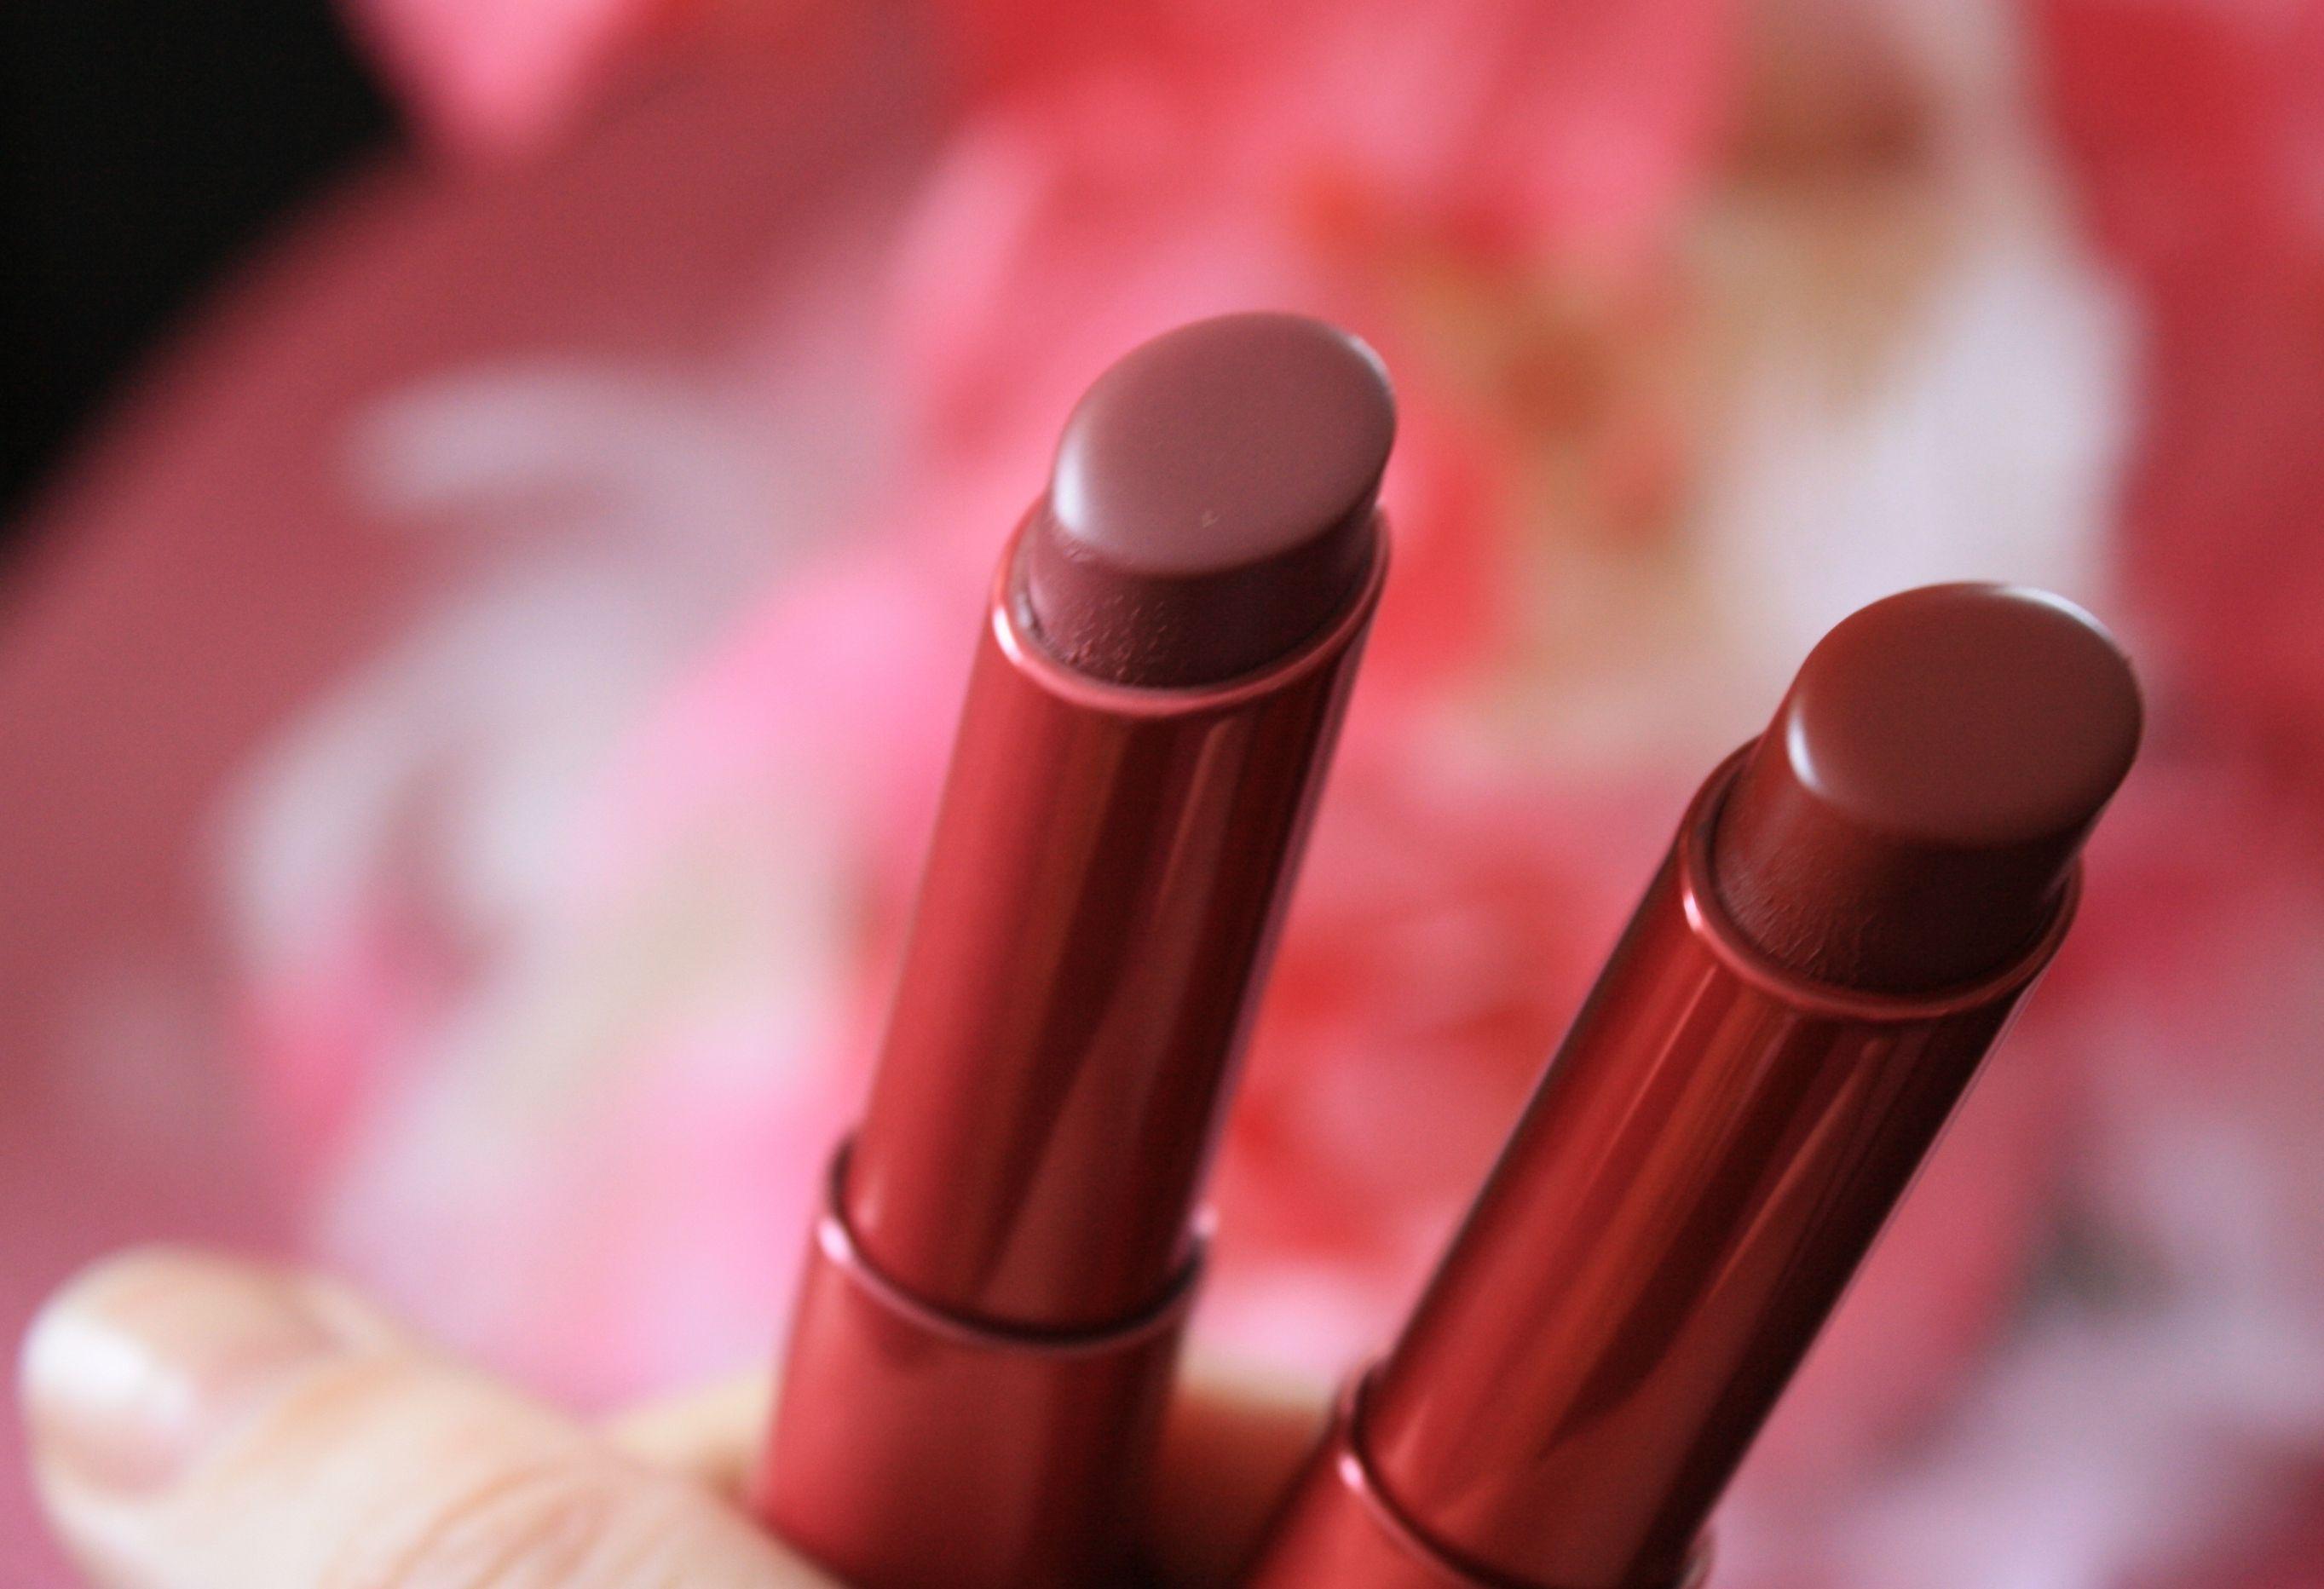 Almay Smart Shade Butter Kiss Lipsticks Vs Revlon Lip Butters